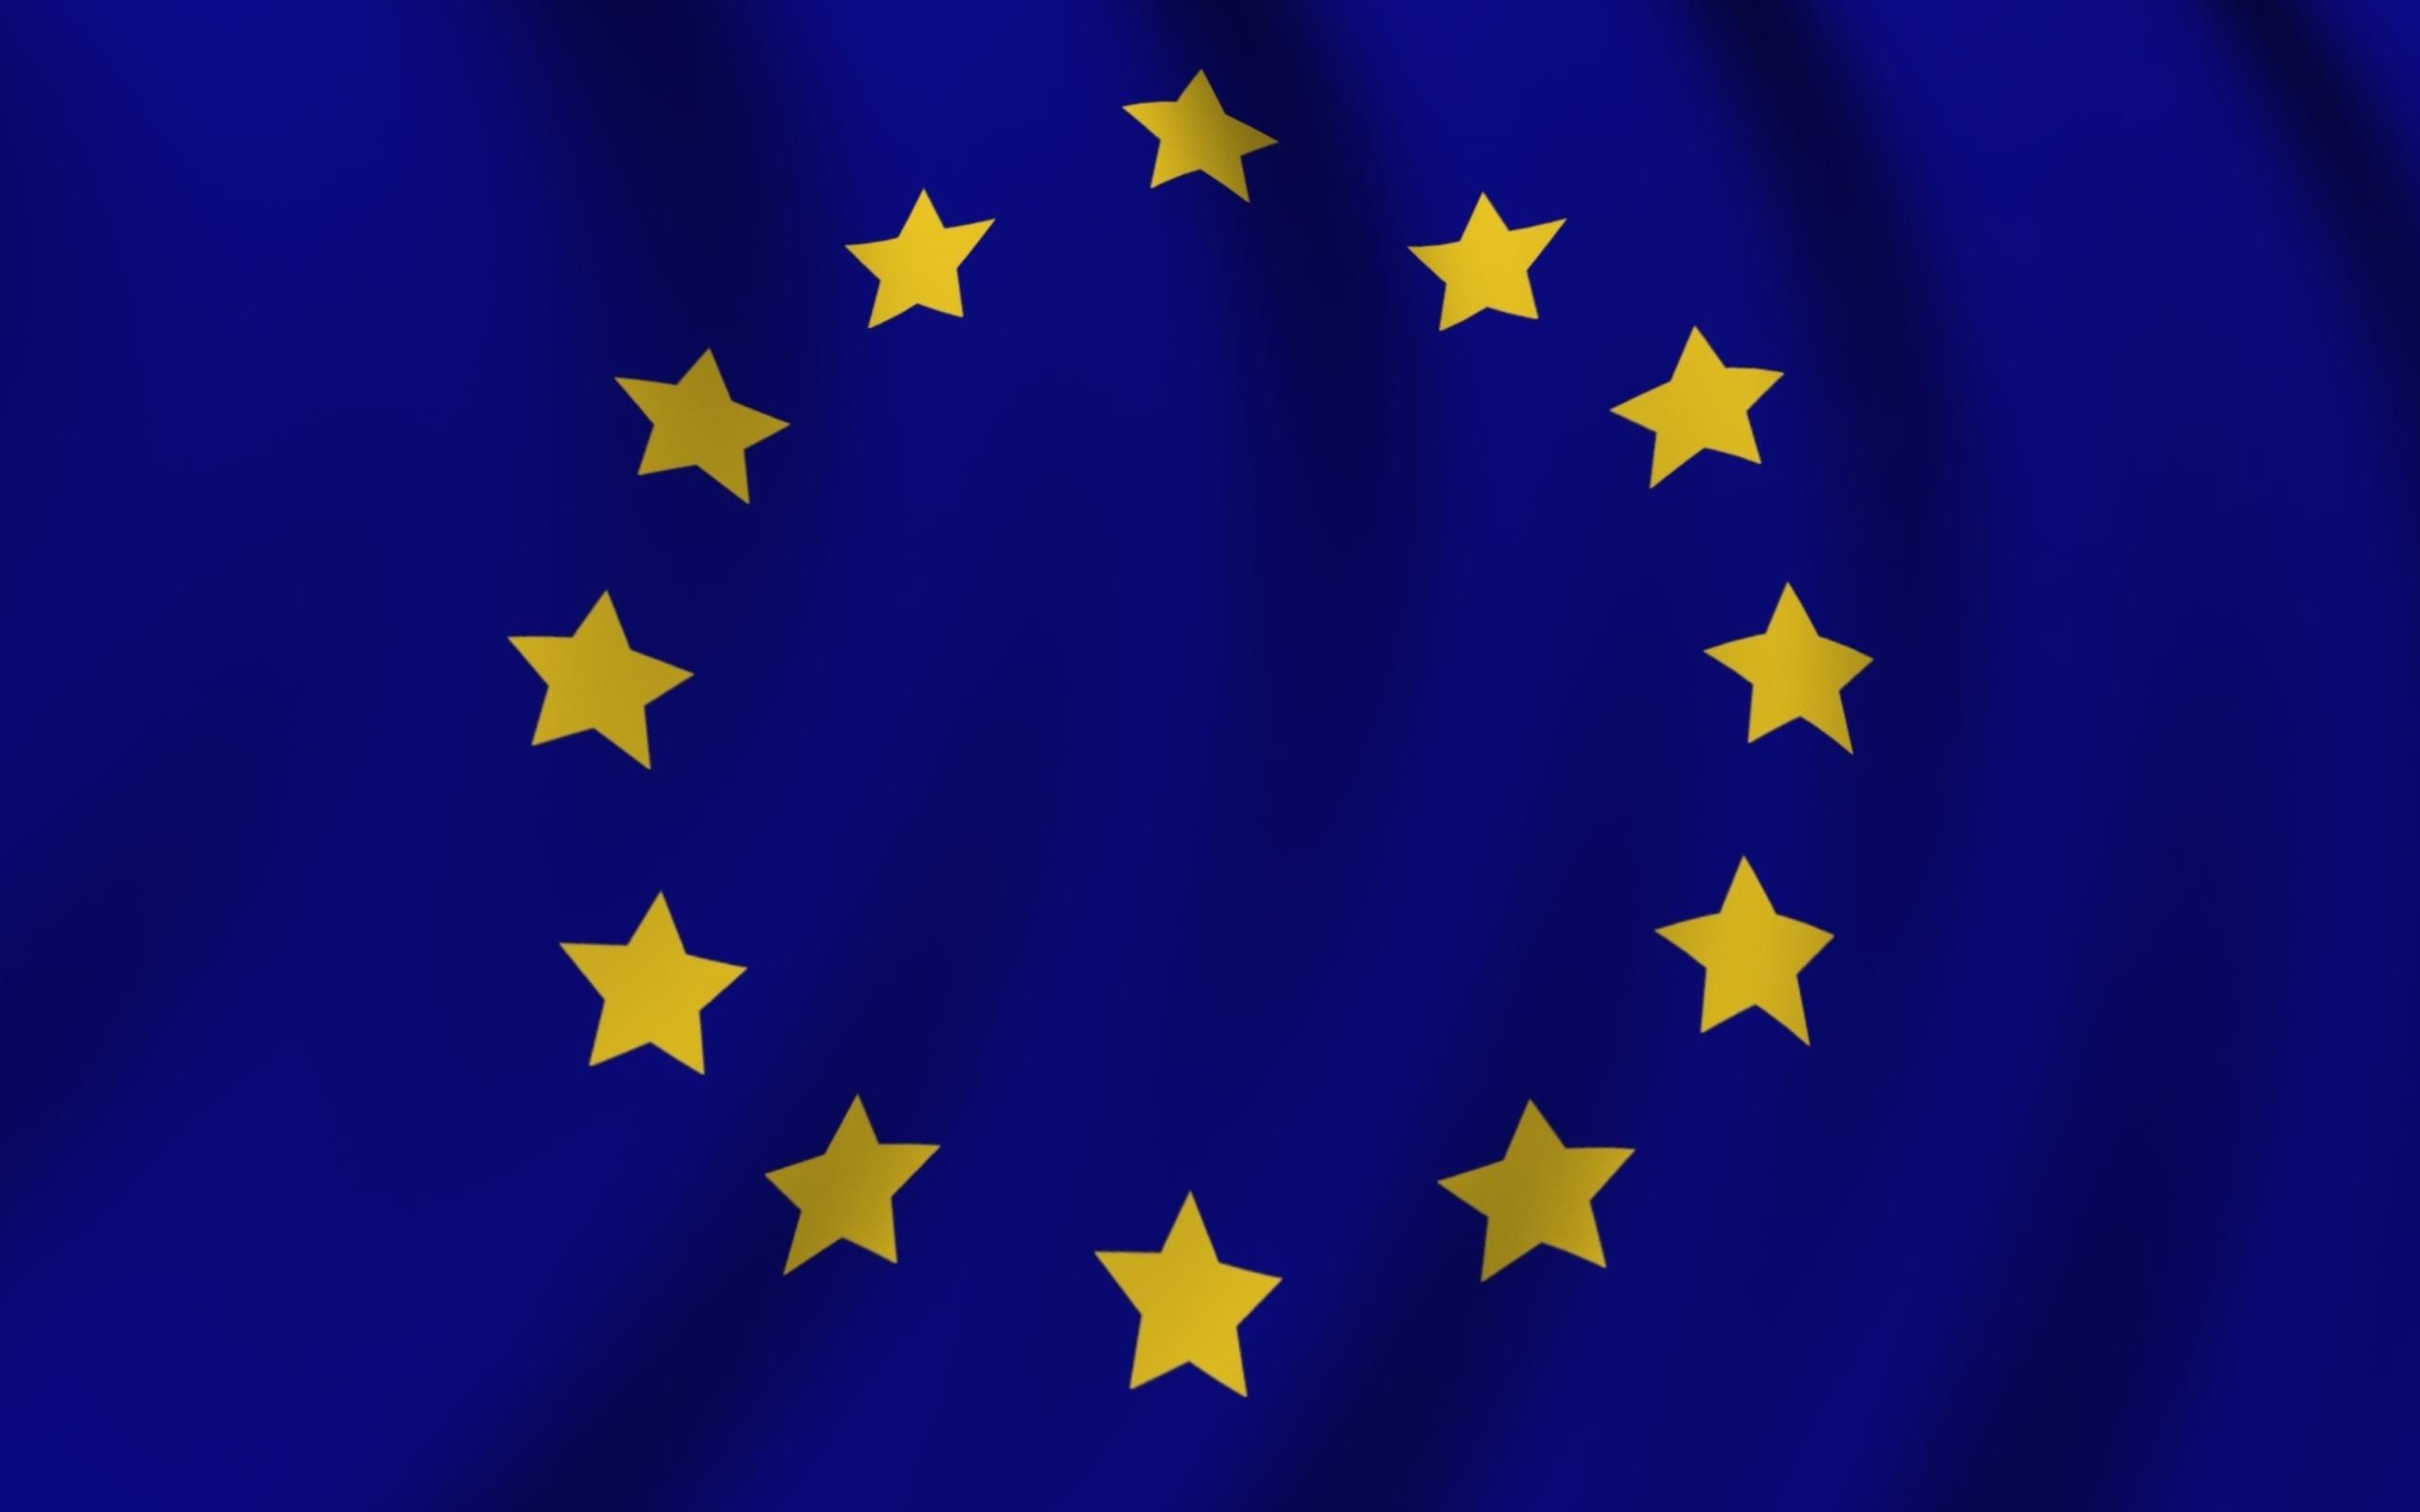 European Union Flags HD Wallpaper Background Image 2560x1600 2560x1600